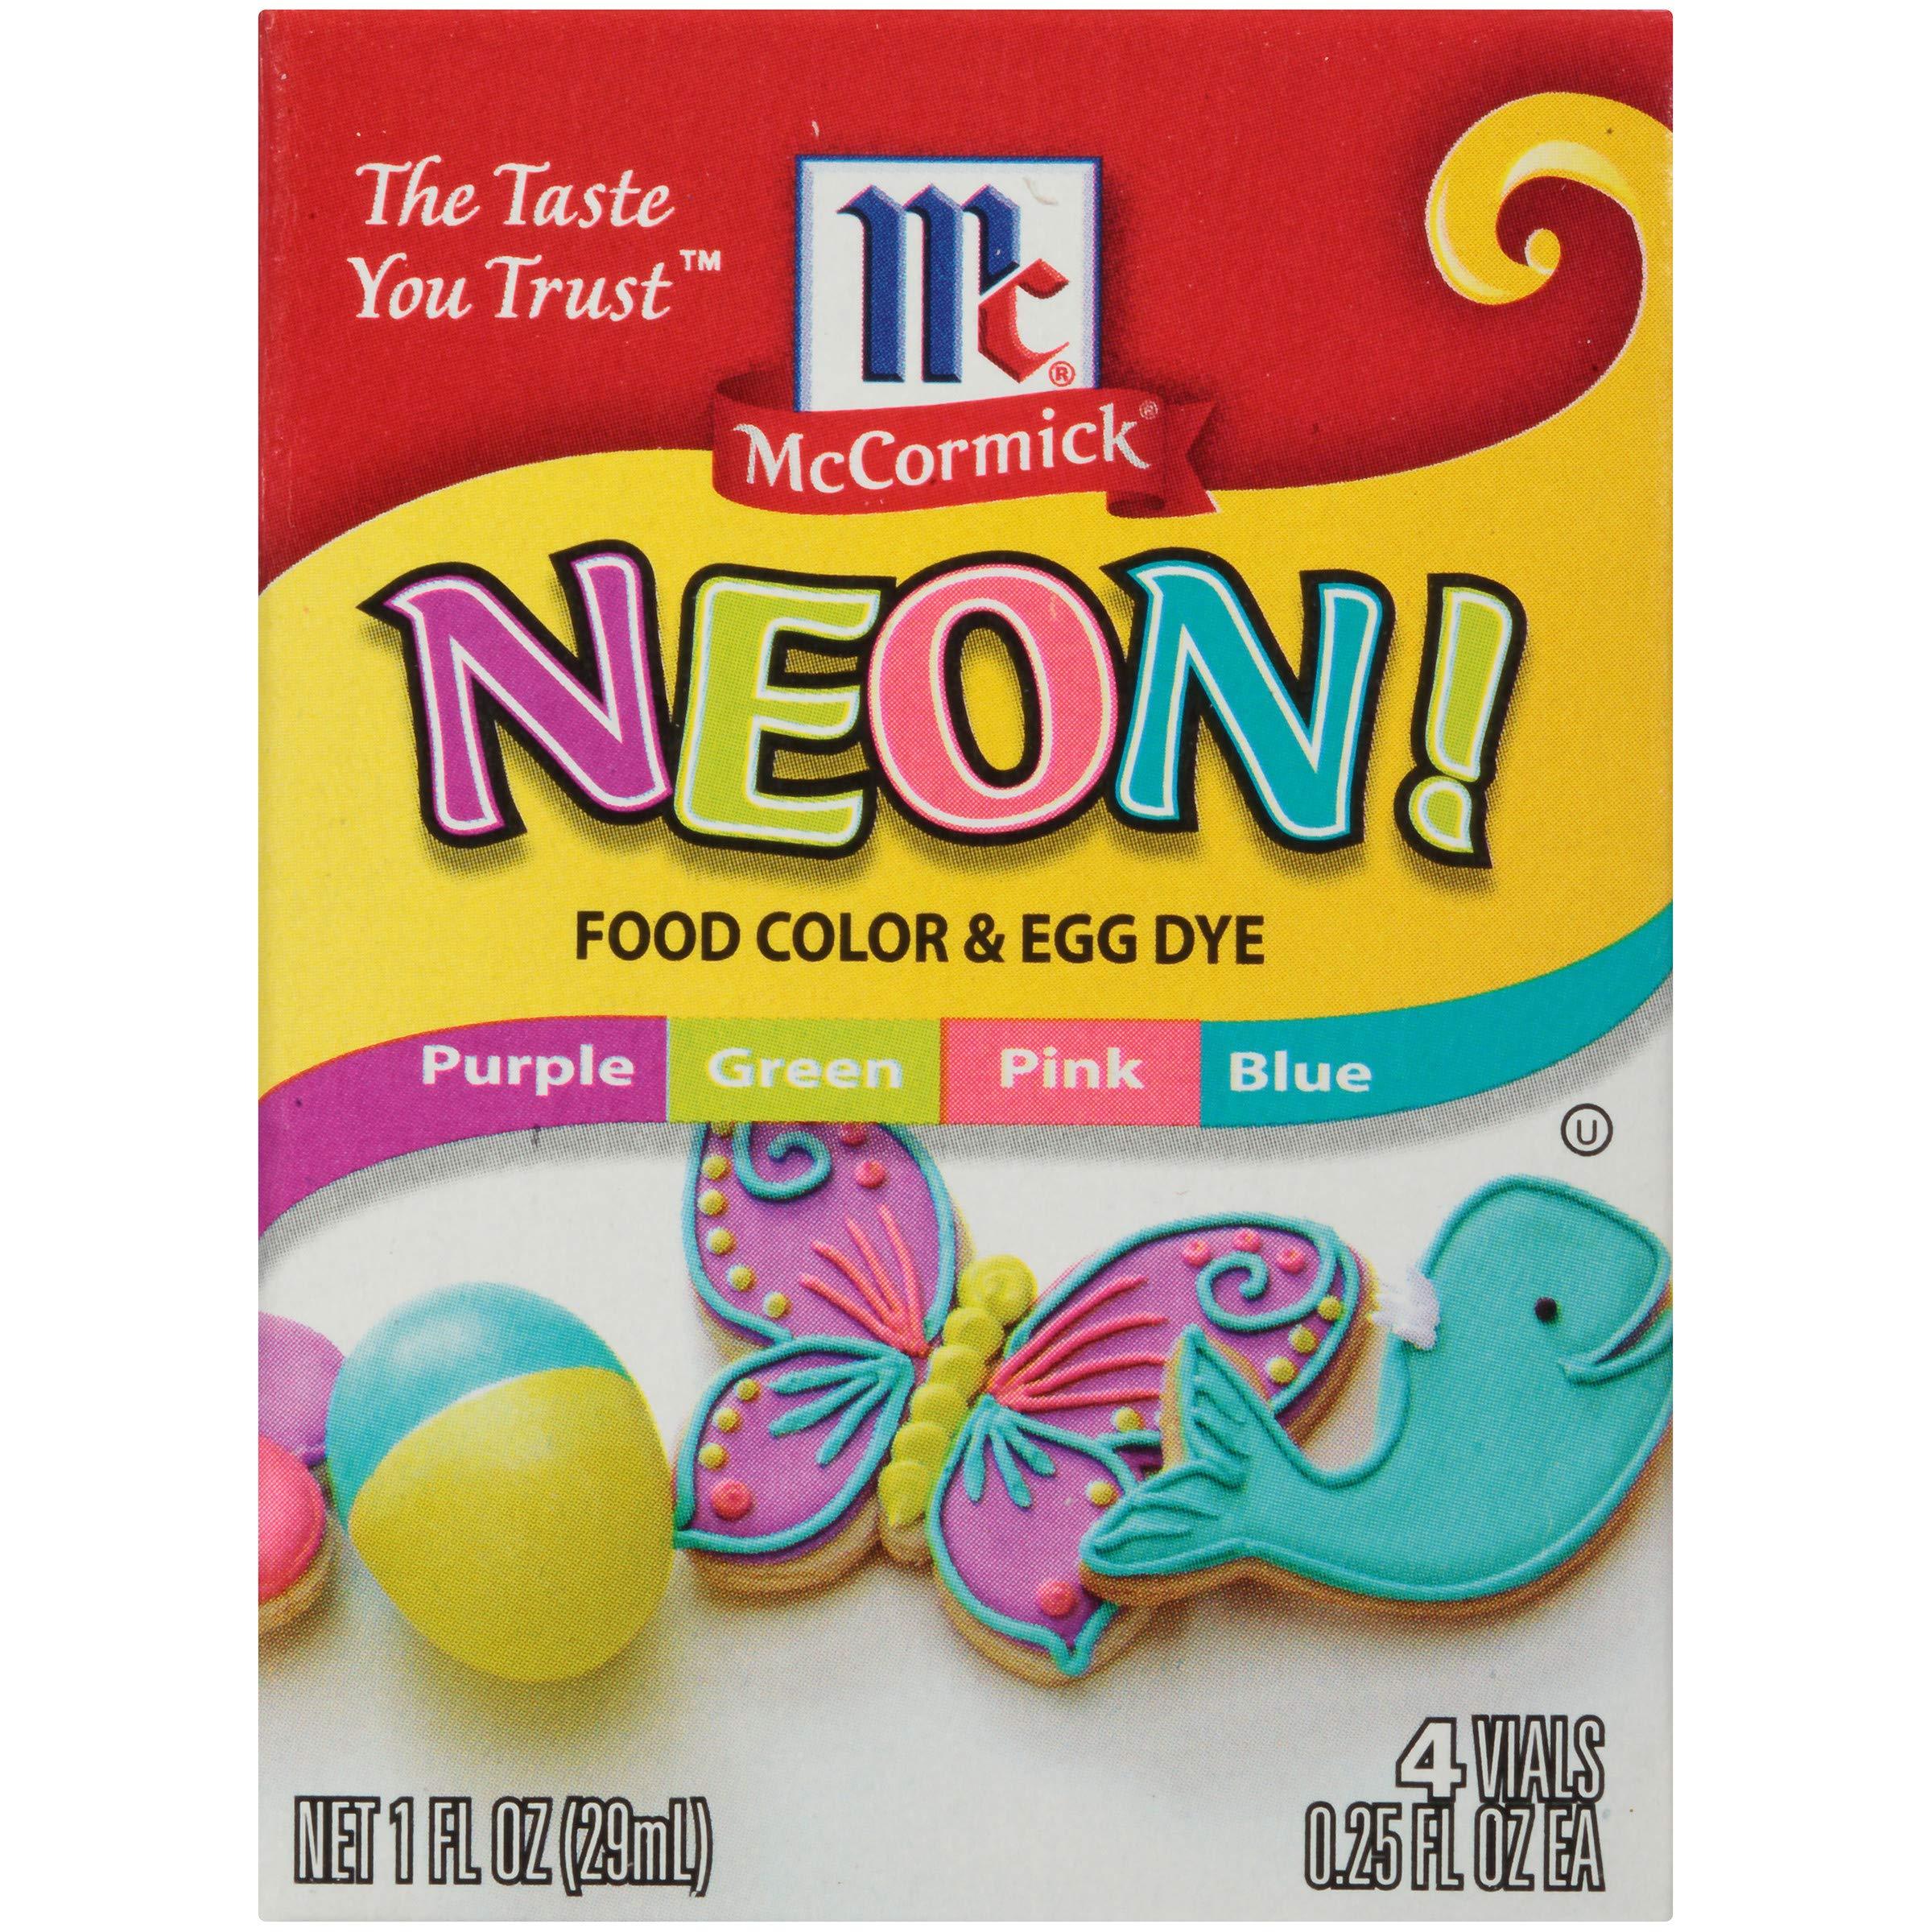 McCormick Neon Assorted Food Color & Egg Dye, 1 fl oz, 4 Count